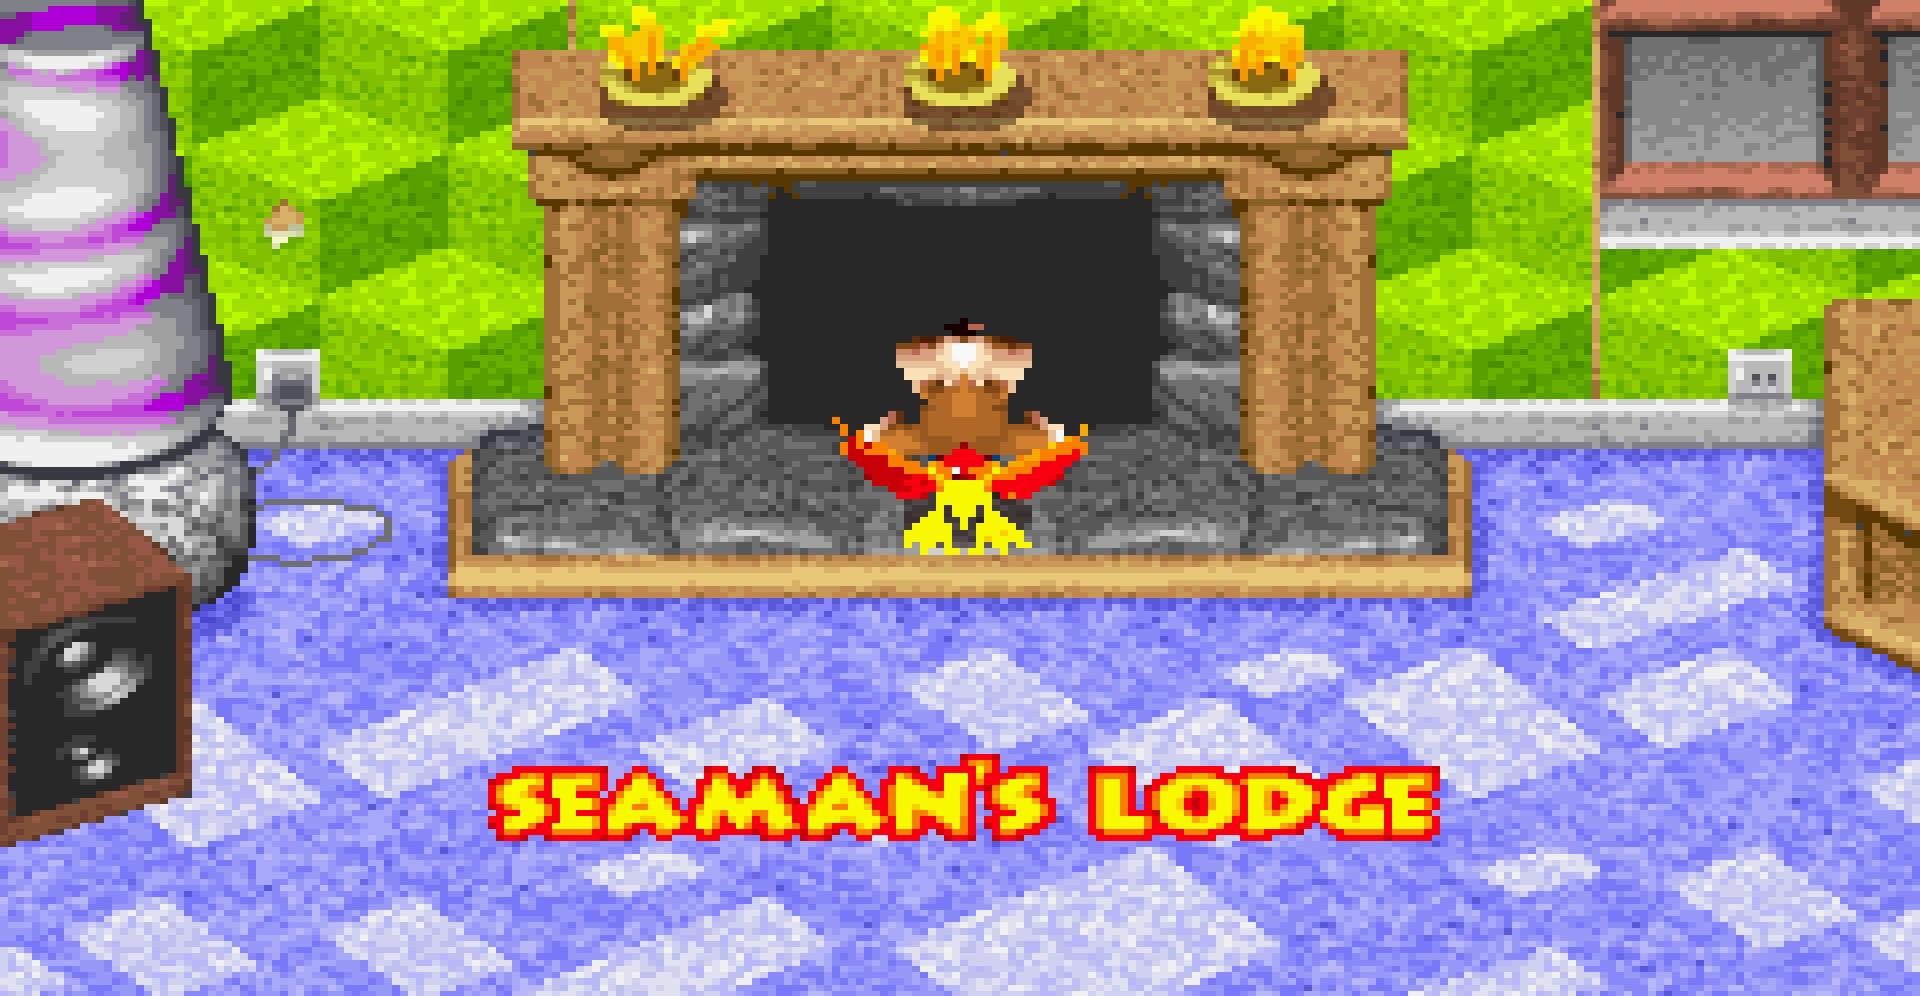 Seaman's Lodge